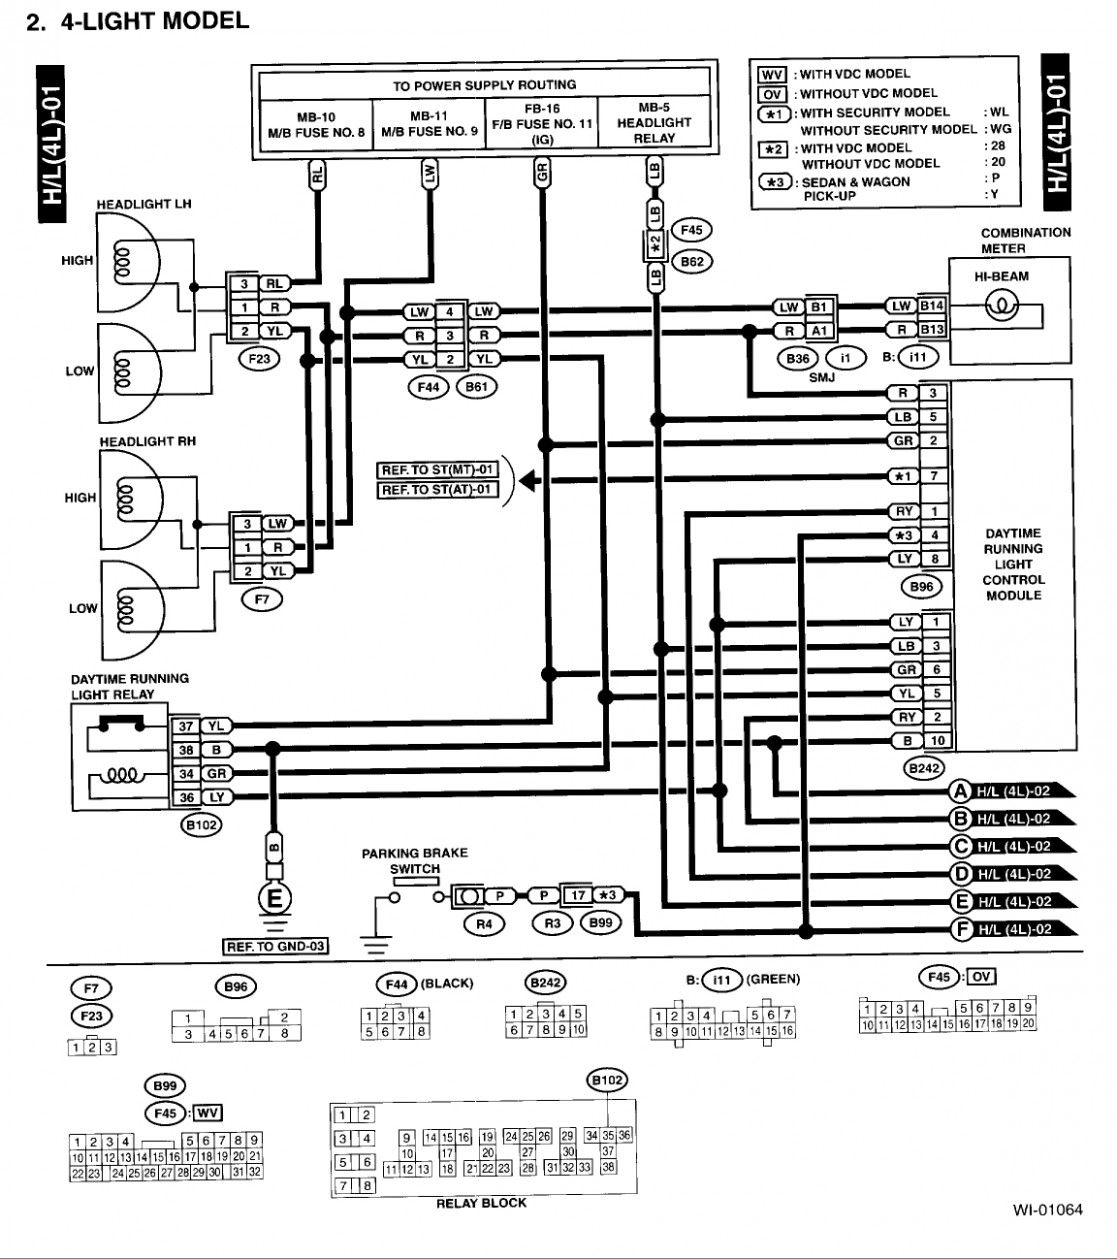 Subaru Impreza Engine Wiring Diagram Di